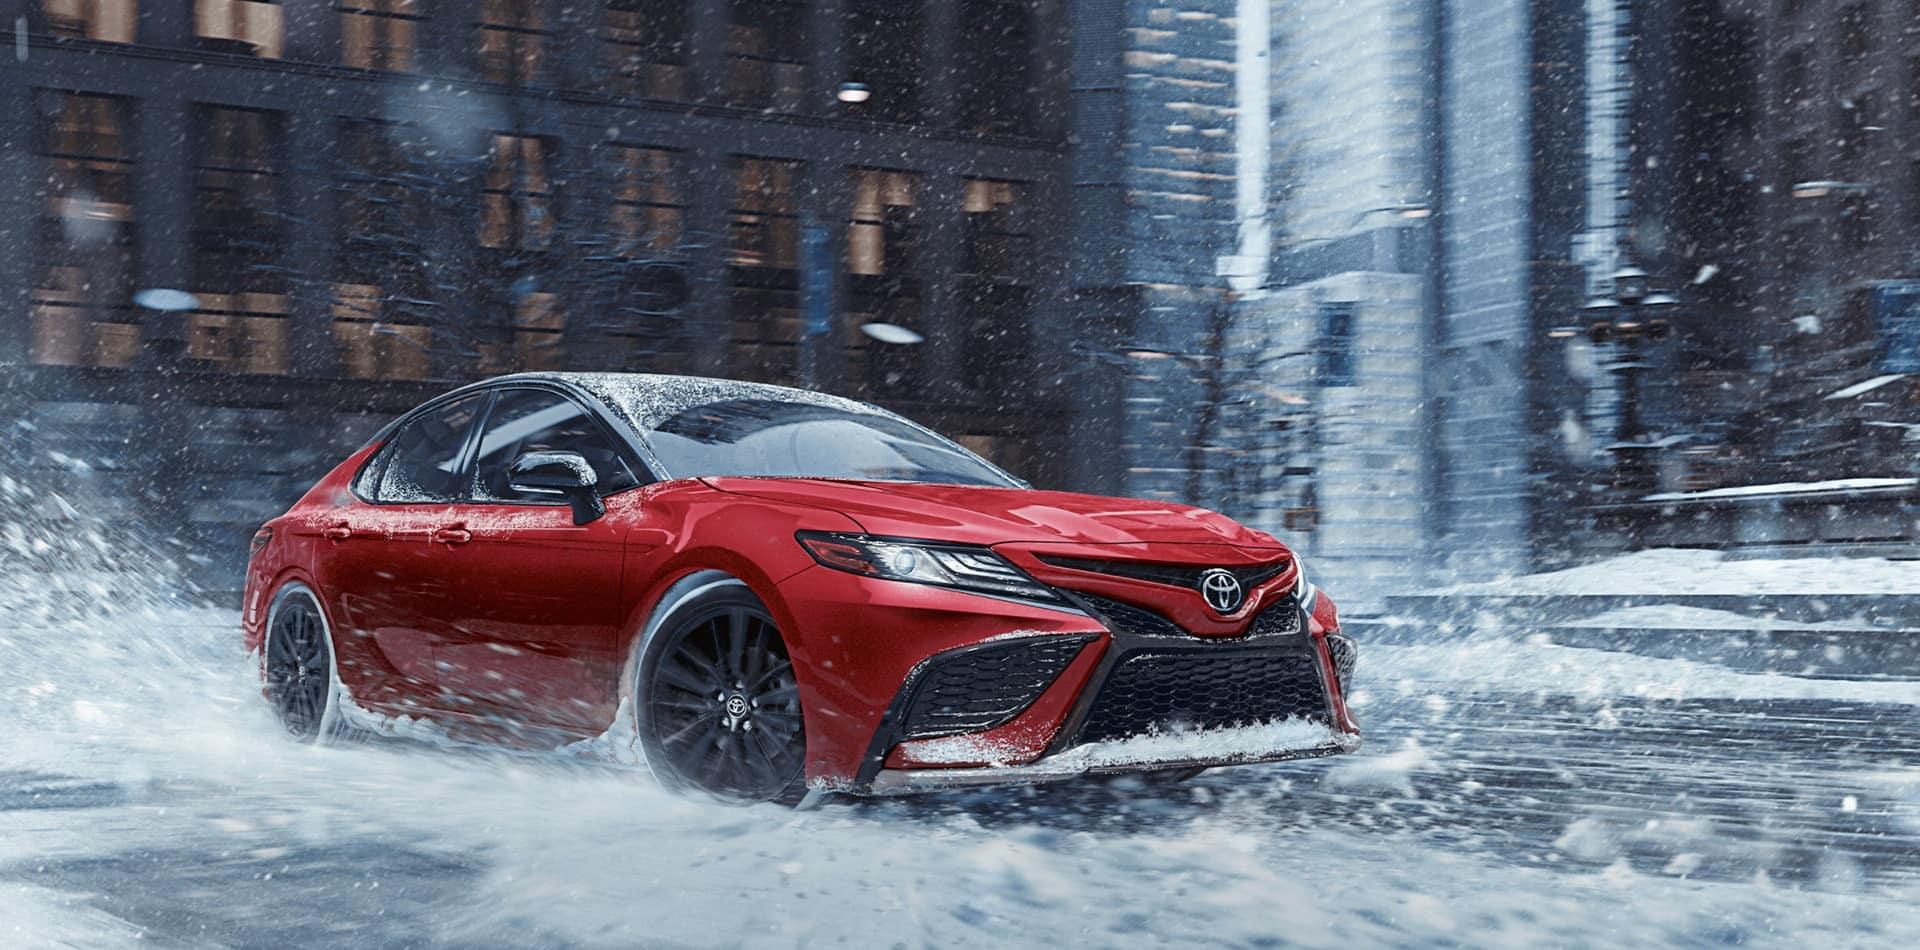 2021 Toyota Camry near St. Louis